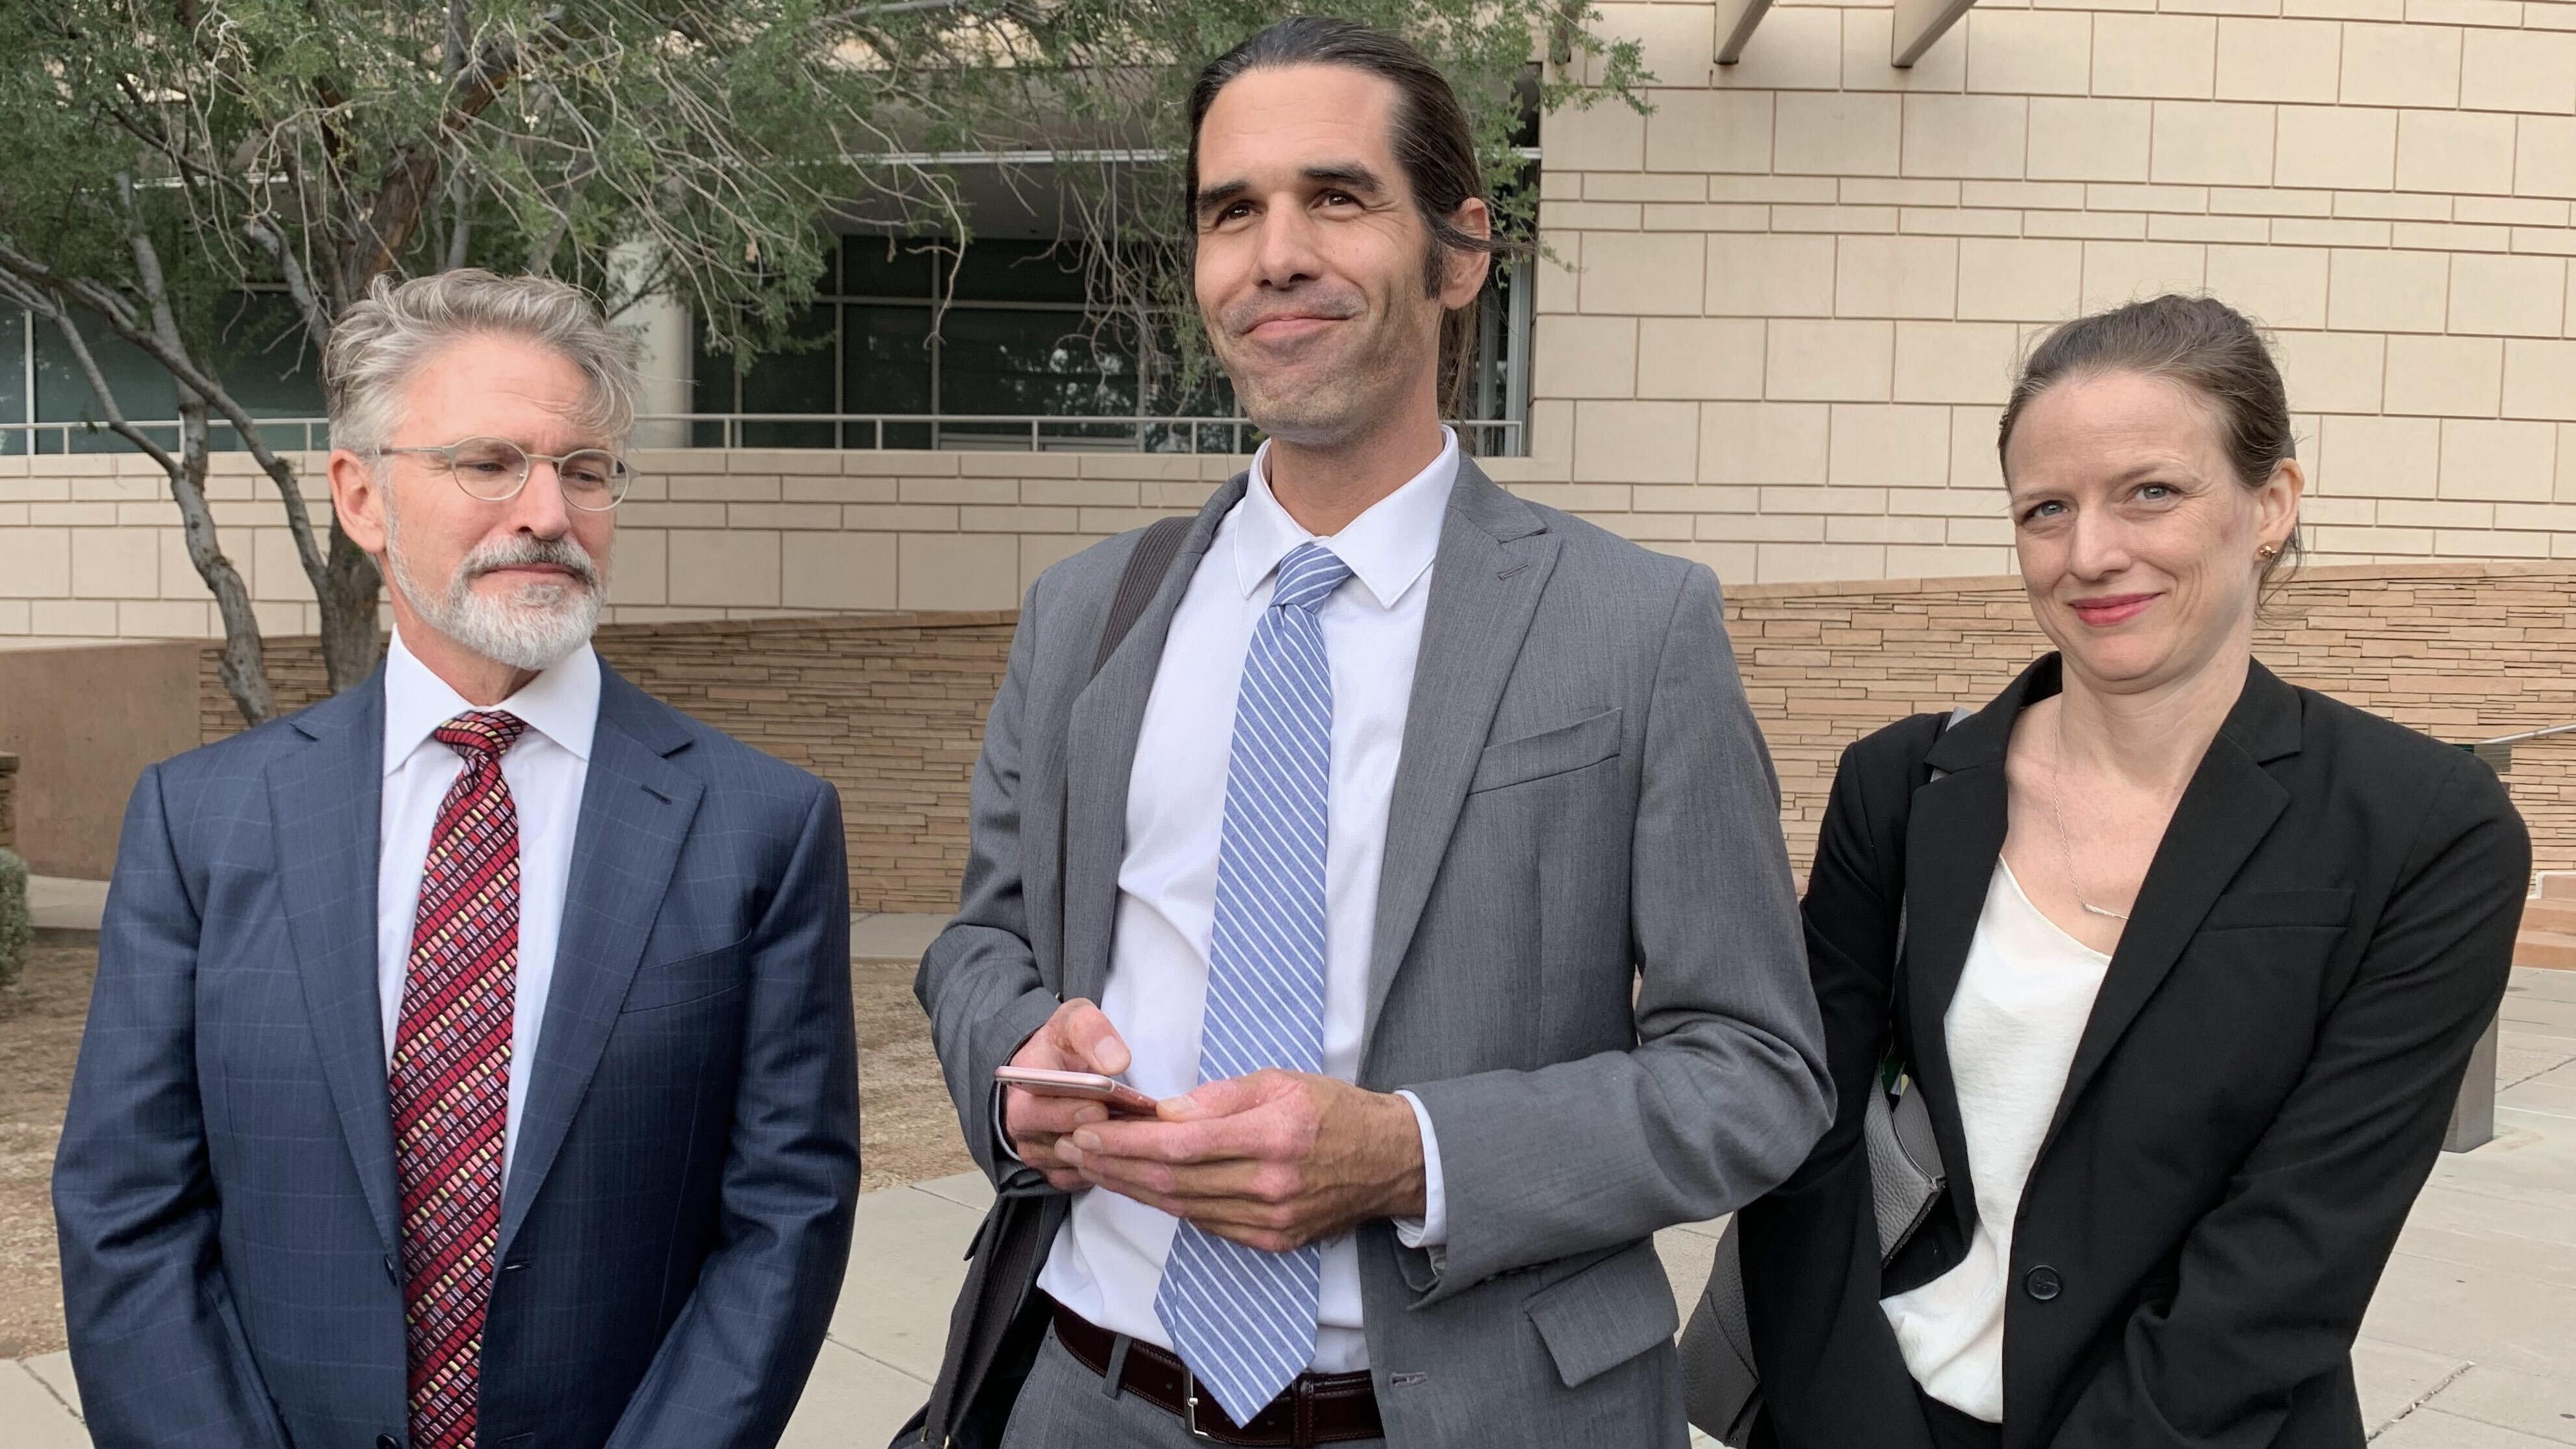 Jury Acquits Aid Worker Accused Of Helping Border-Crossing Migrants In Arizona